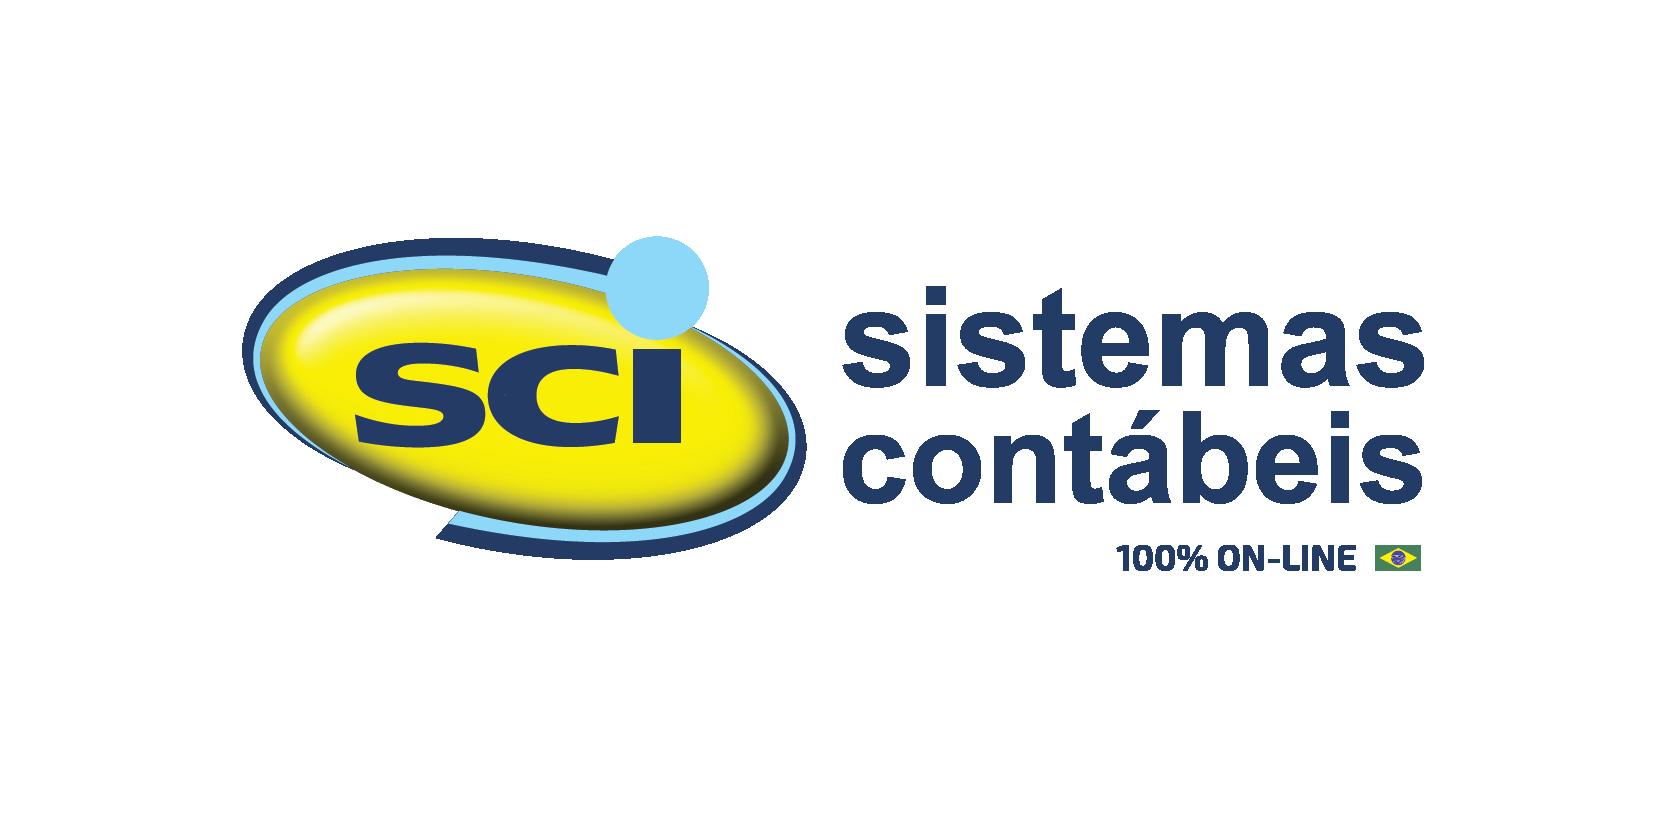 SCI Sistemas Contábeis 100% Online